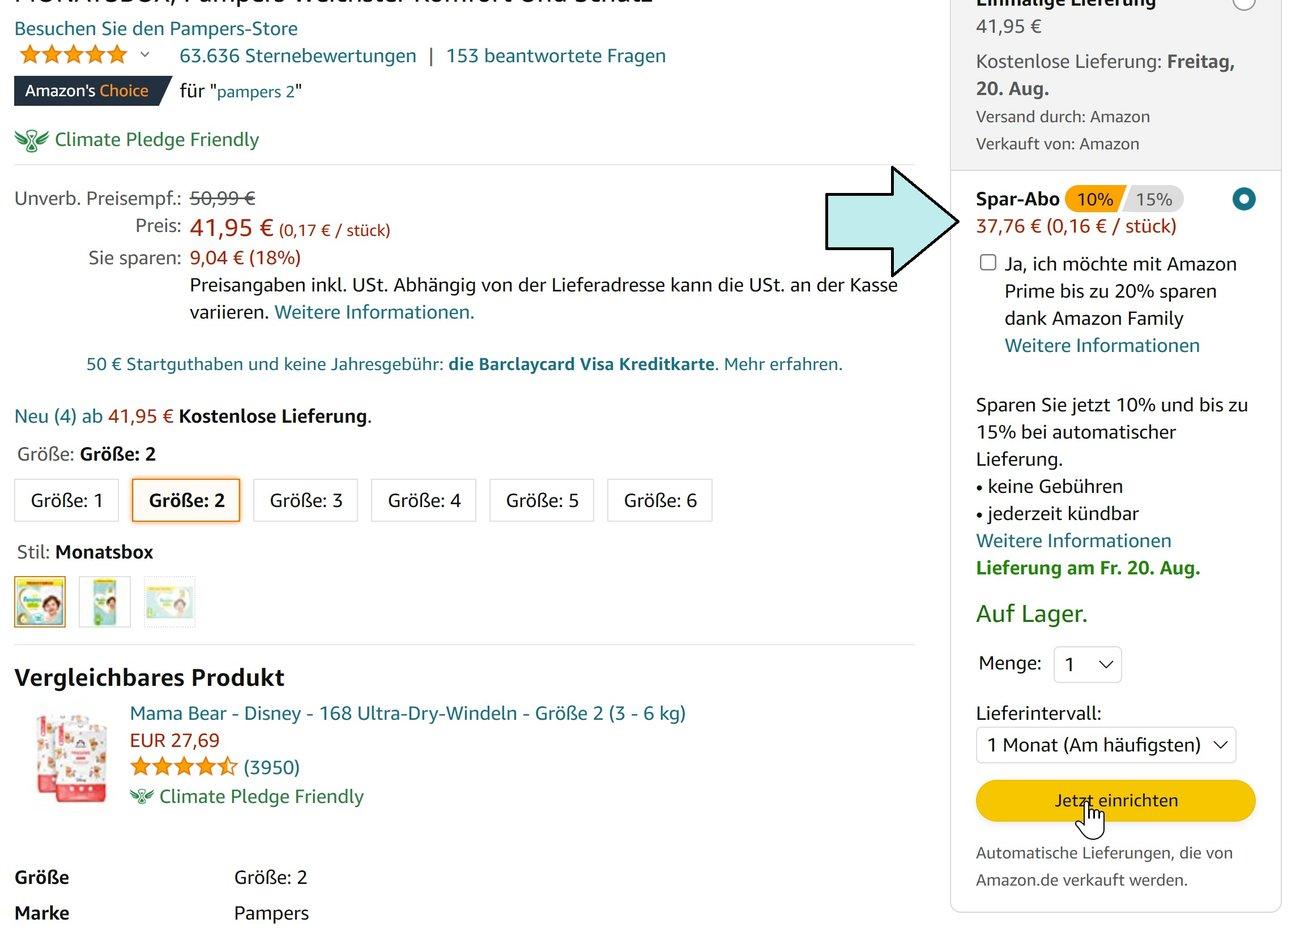 Pampers Sparabo Amazon Screenshot